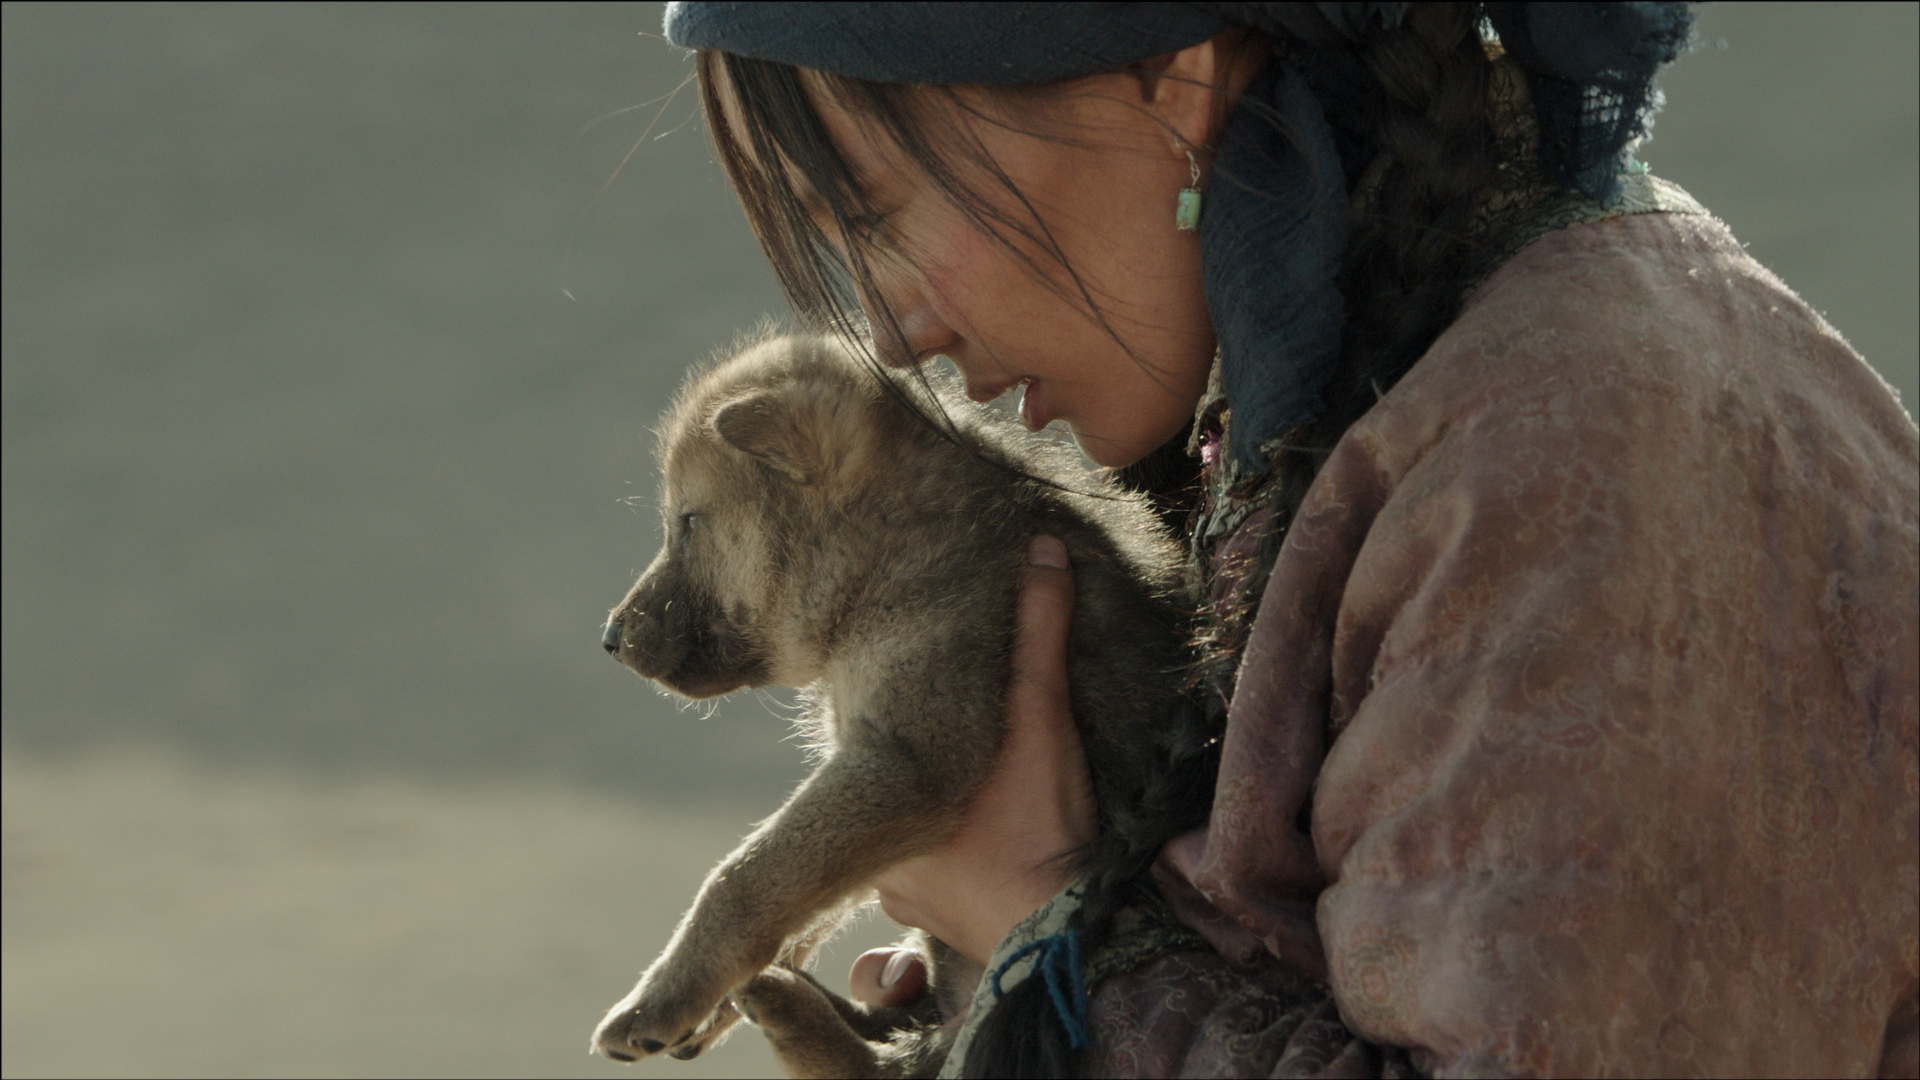 wolf-le-dernier-loup-jean-jacques-annaud-image-23.jpg (1920×1080)